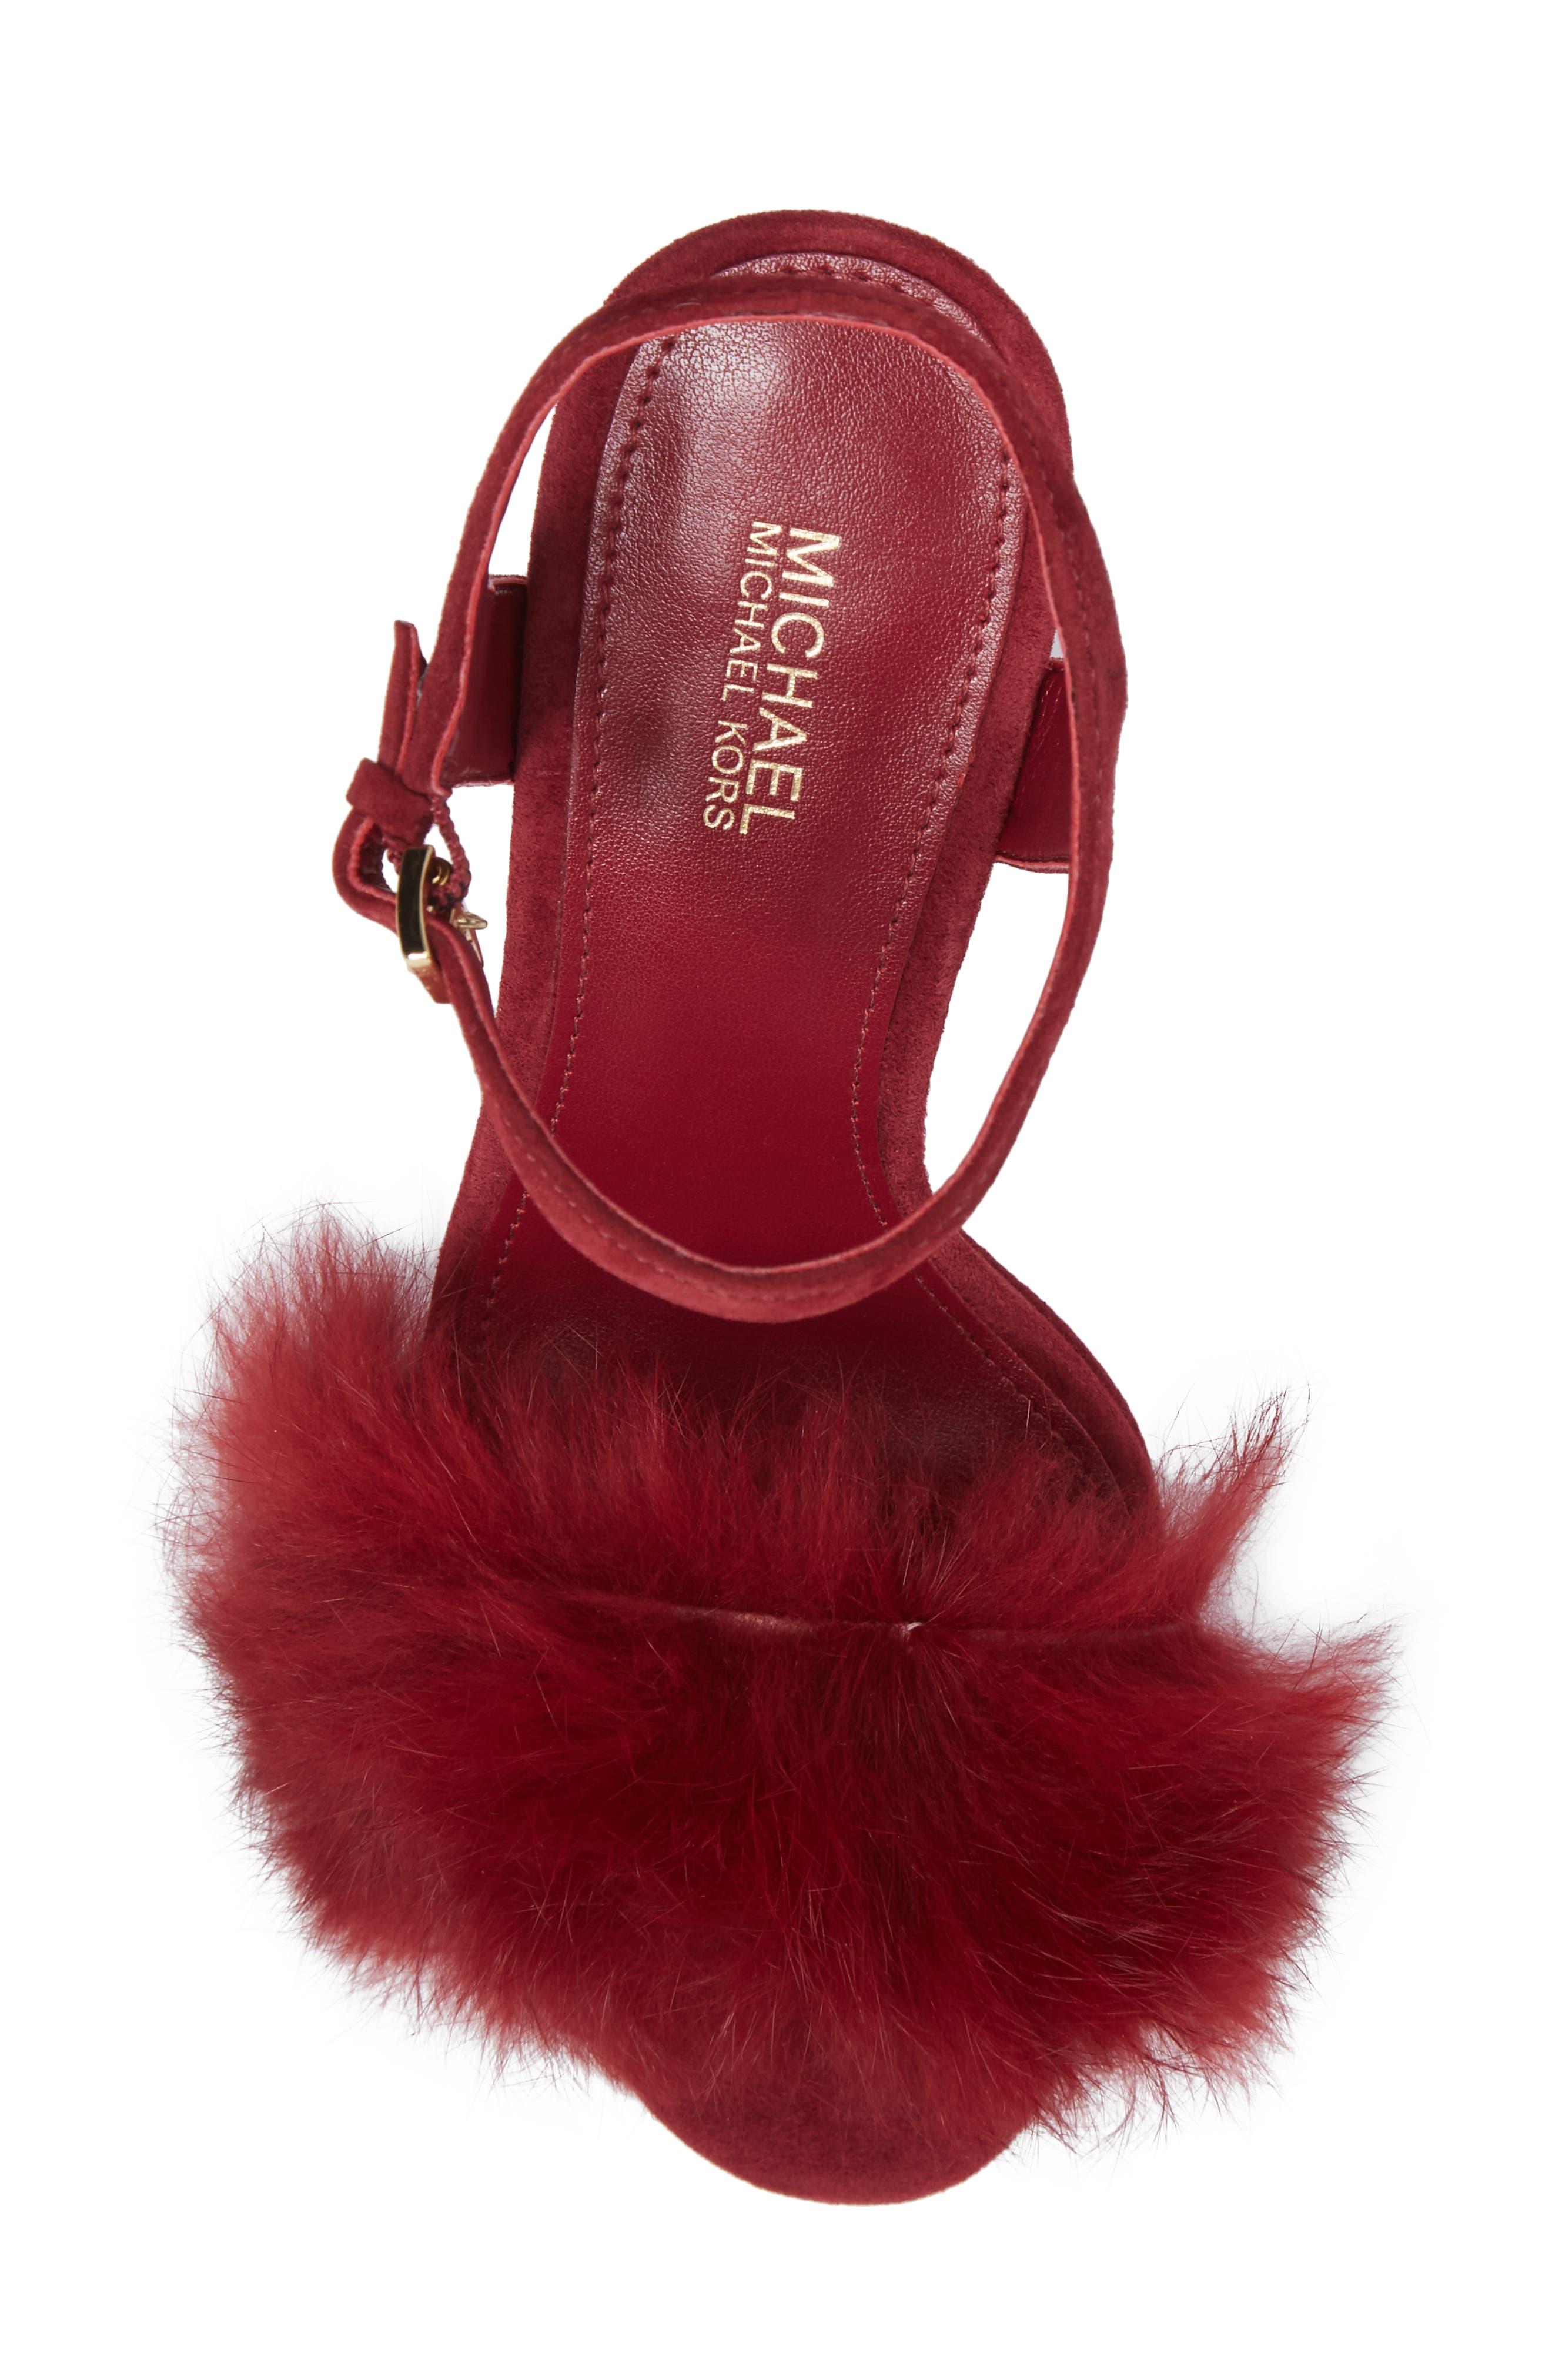 Faye Genuine Rabbit Fur Sandal,                             Alternate thumbnail 5, color,                             Mulberry Suede/ Fur